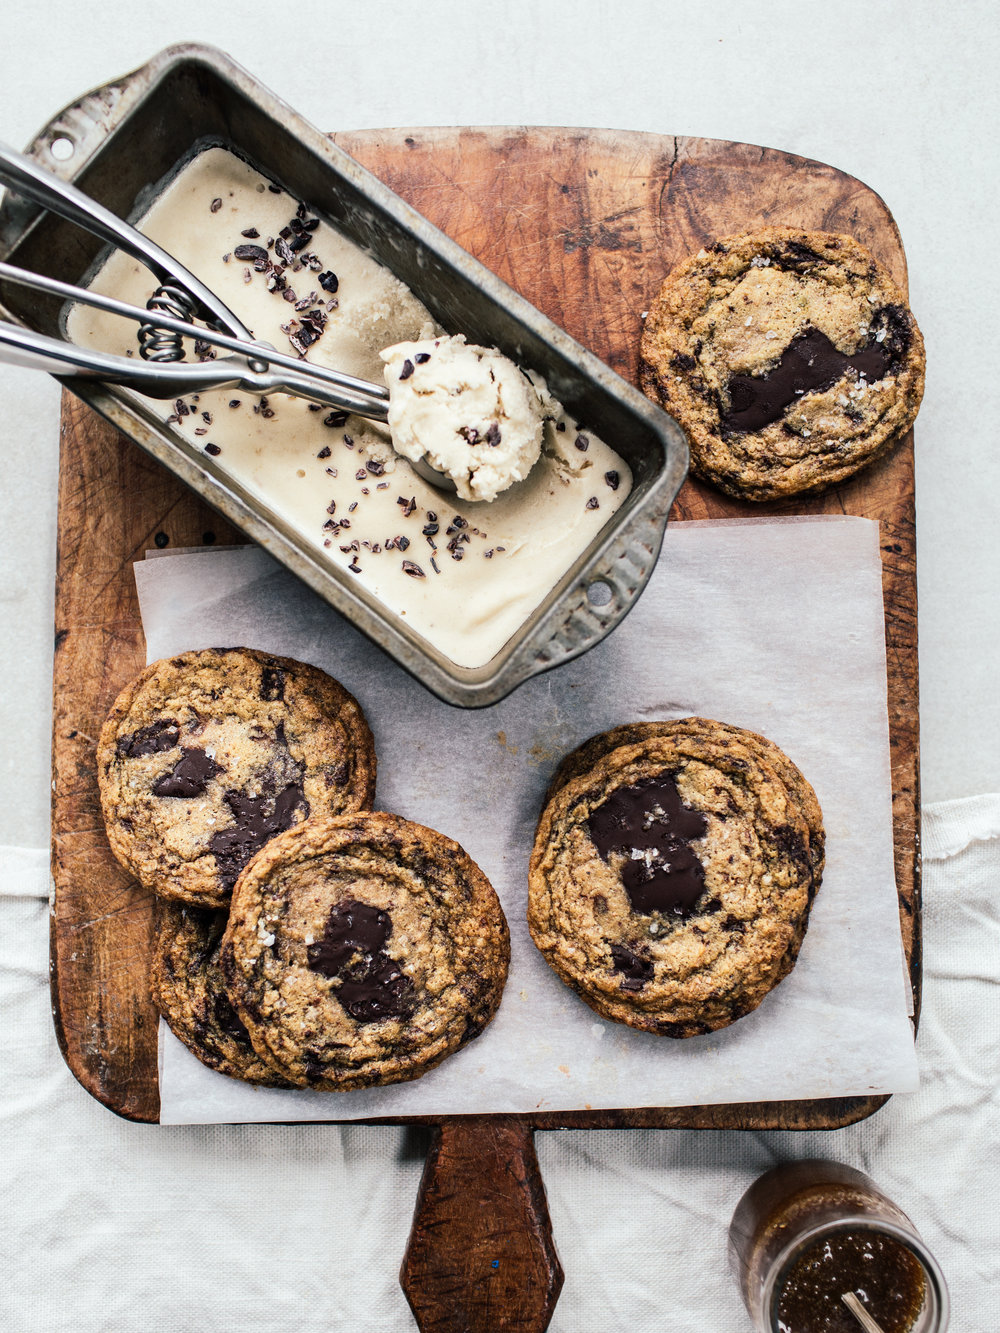 Banoffee Ice Cream Sandwiches By Izy Hossack